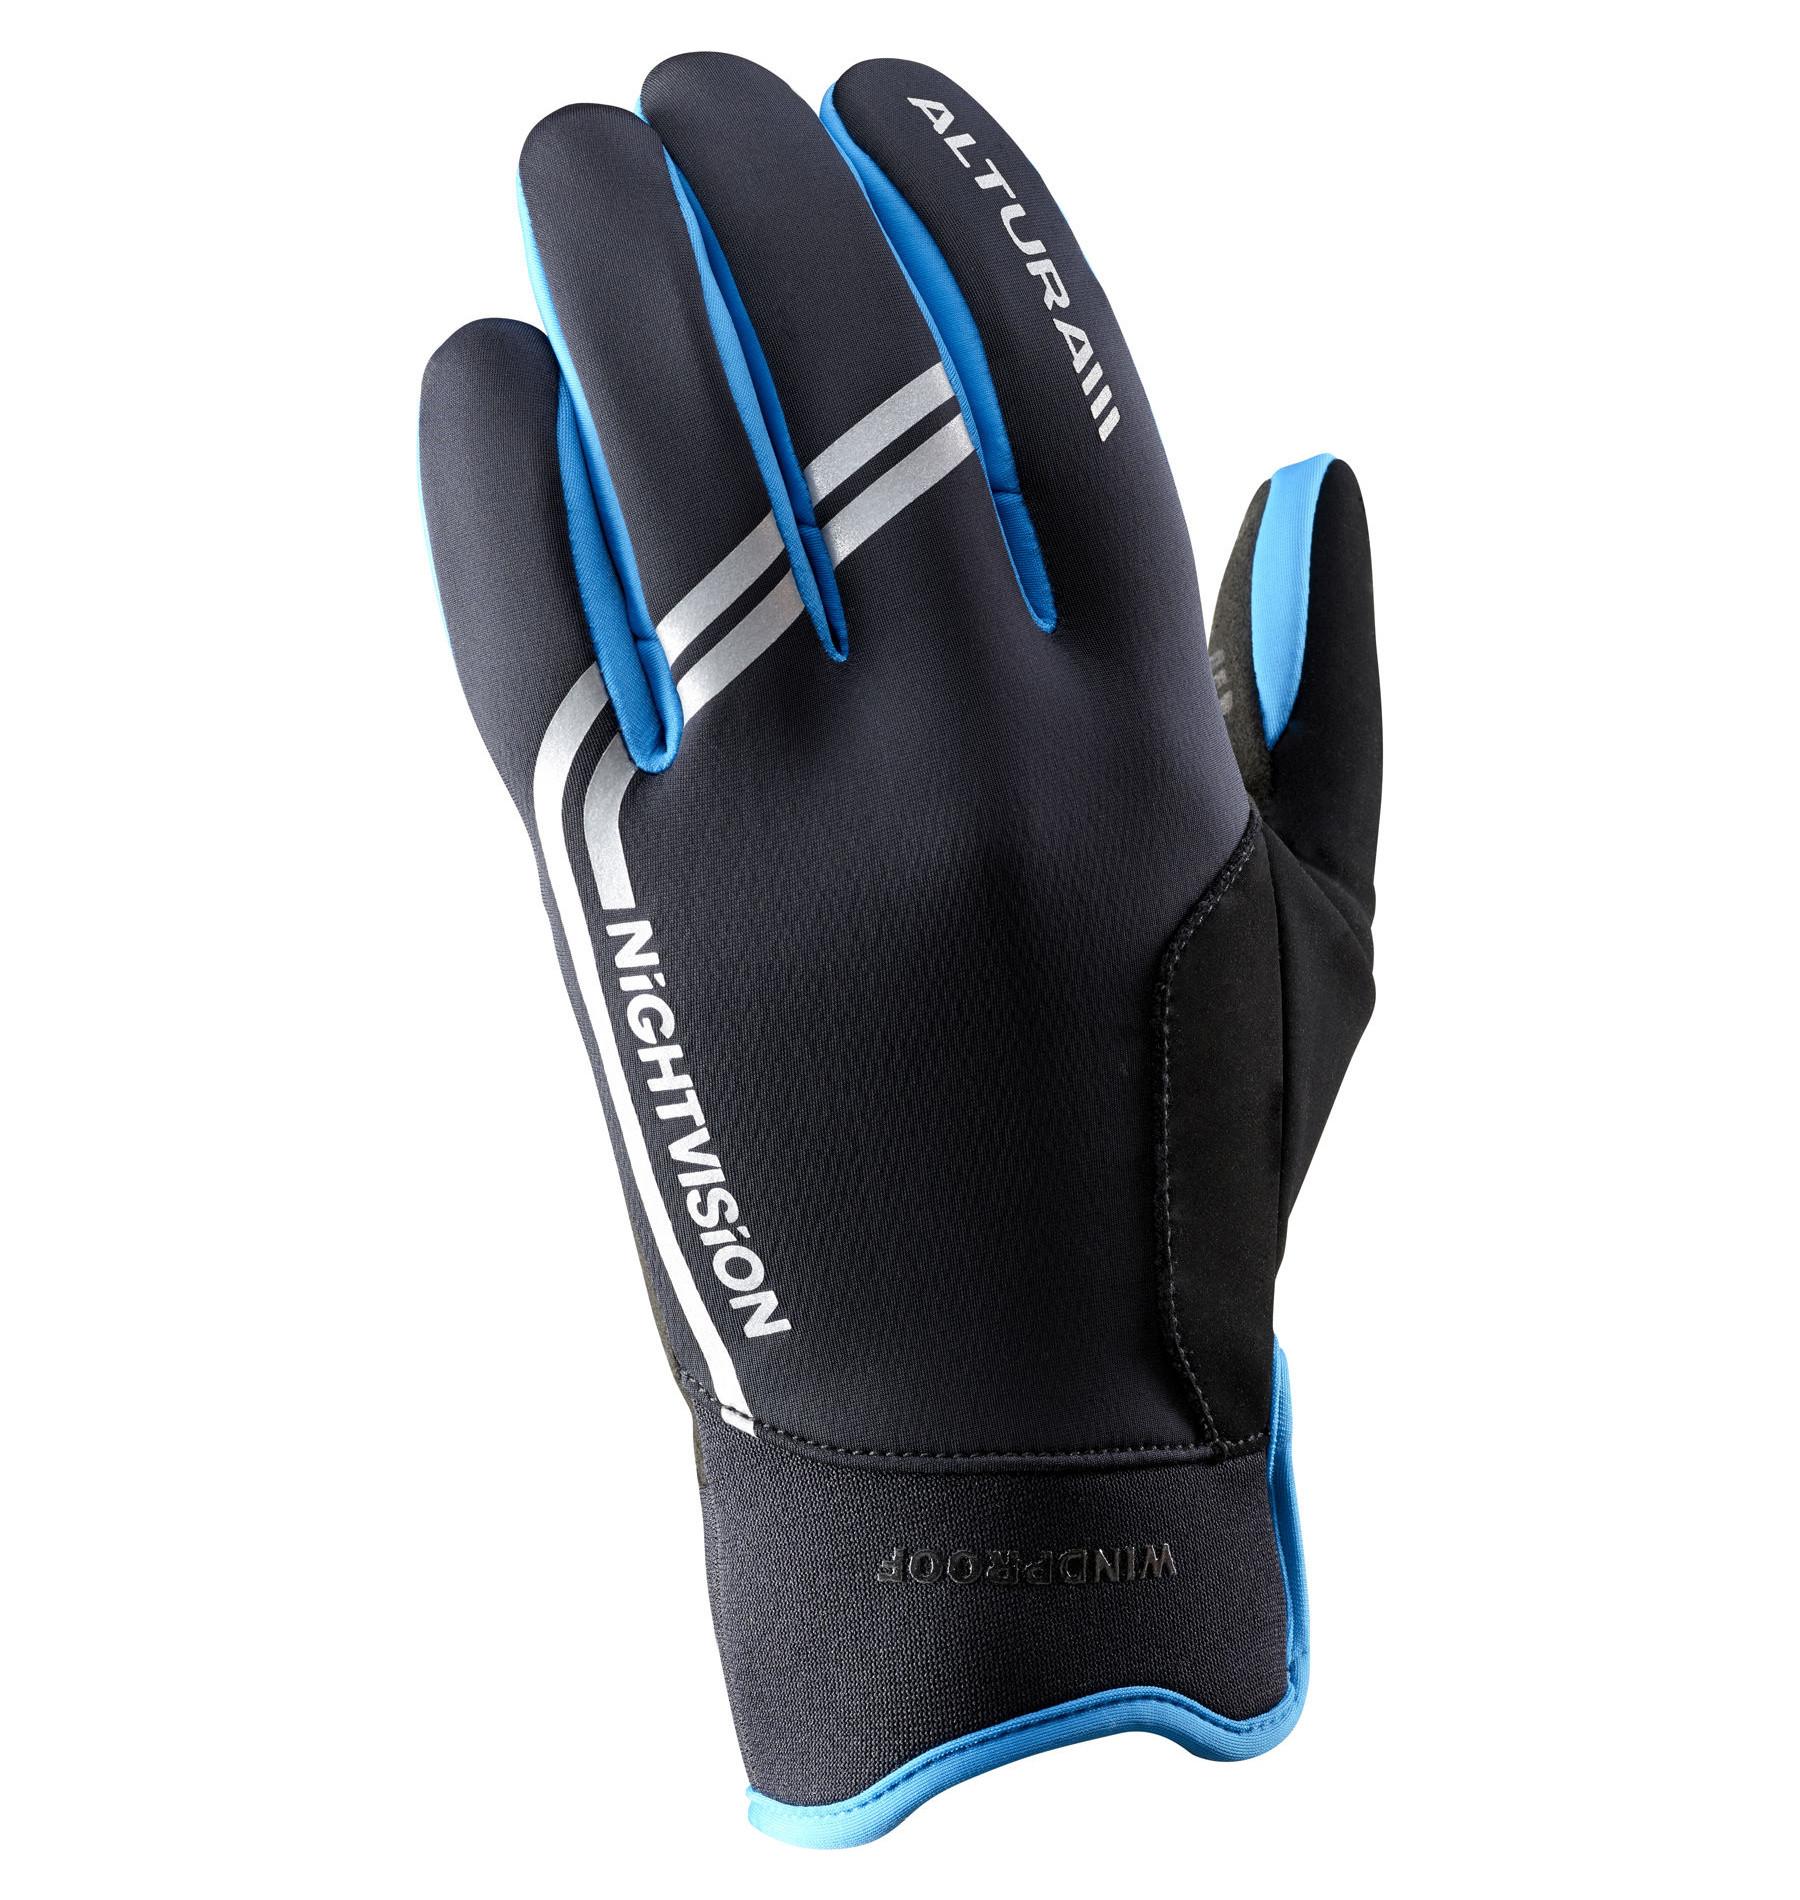 Altura - Nightvision | bike glove